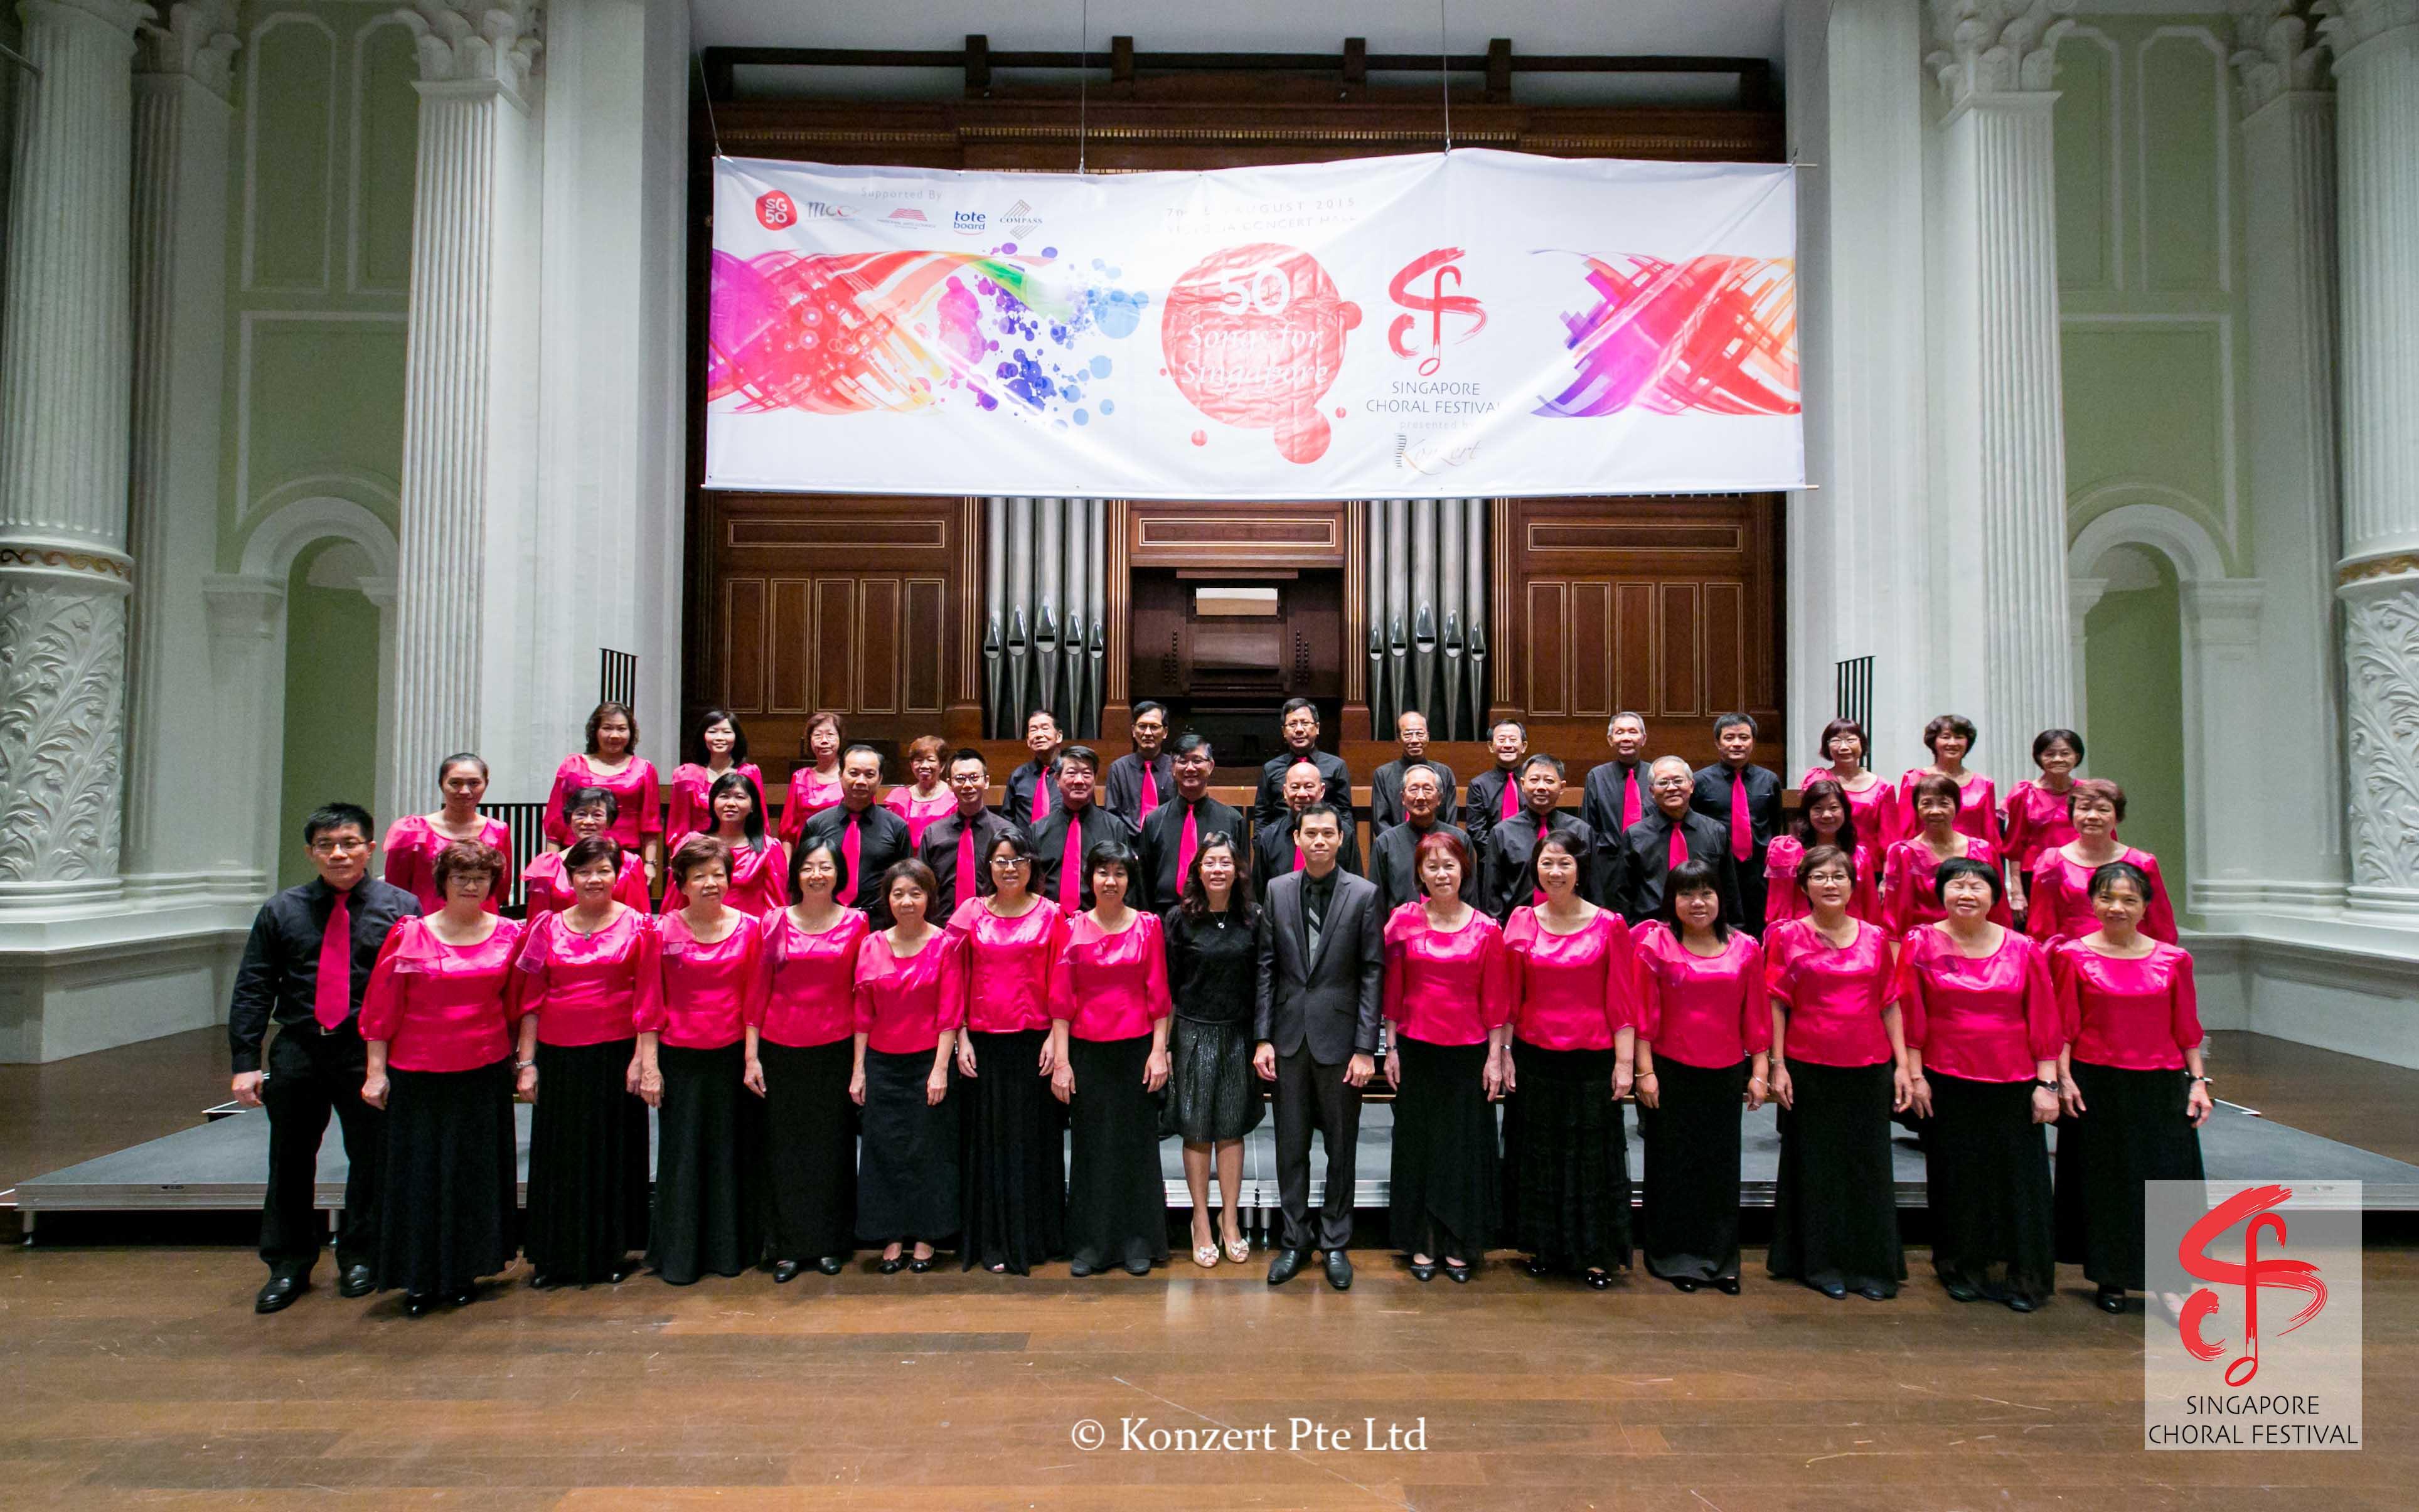 Singapore Choral Festival 7-8-15 (20).jpg